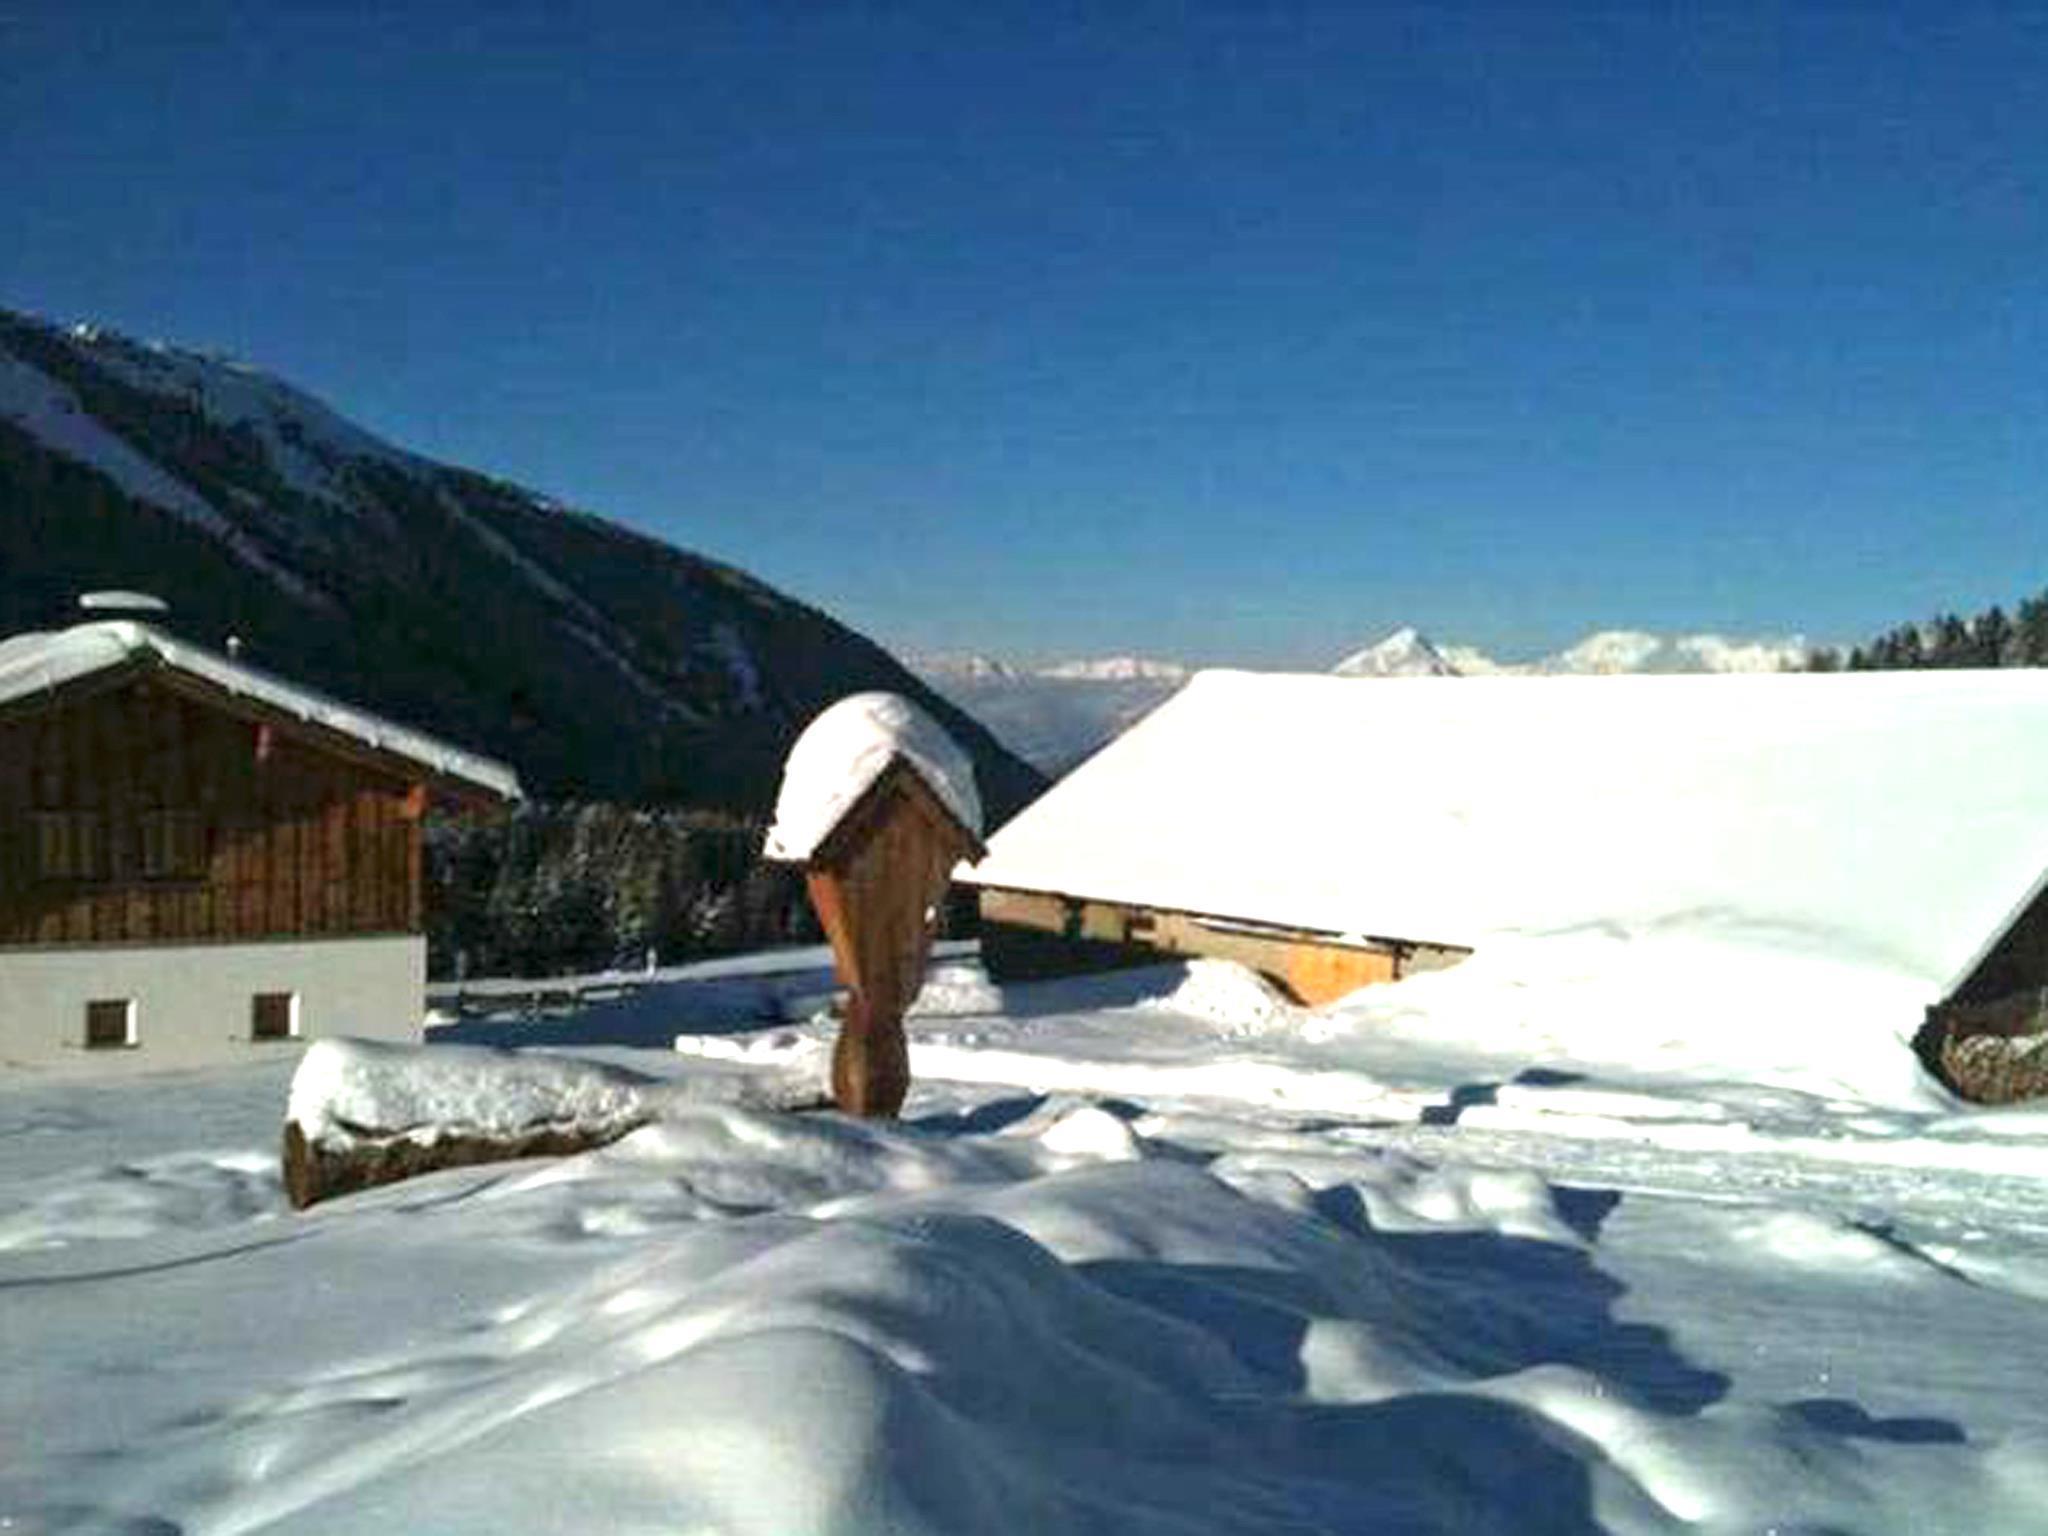 Kemater-Alm-Winter.jpg